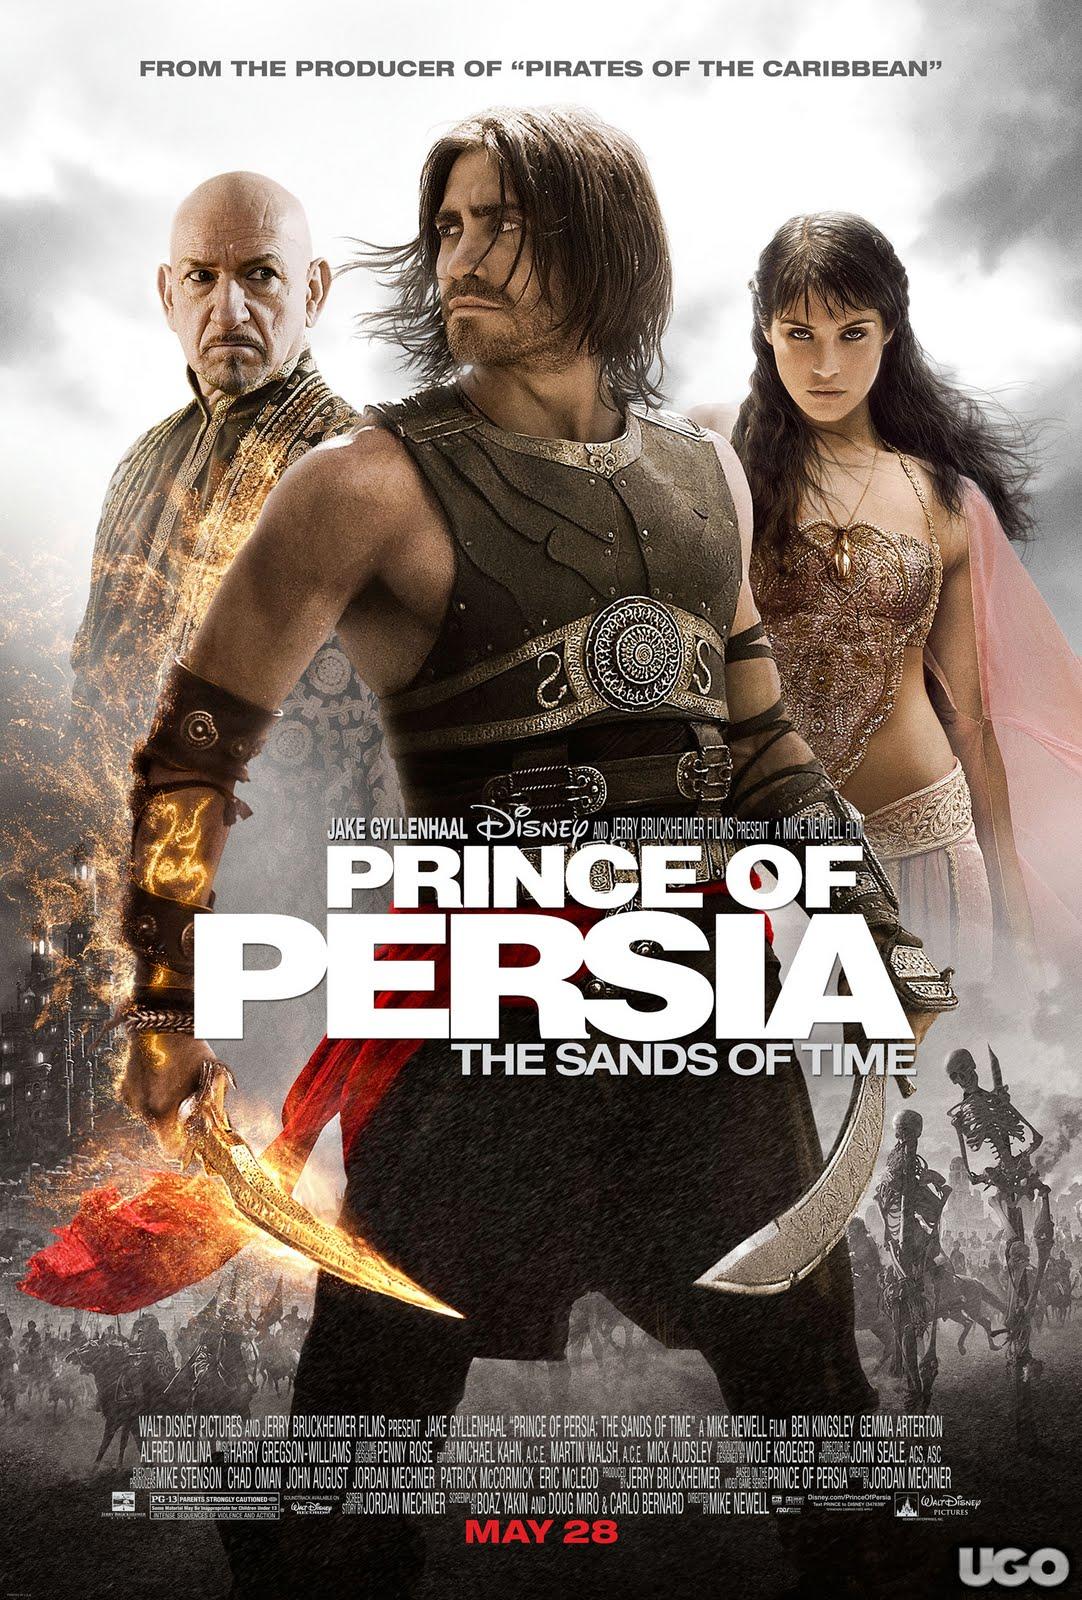 http://1.bp.blogspot.com/_7JDPMTweaaI/TKHjChqLO_I/AAAAAAAAEps/3zXWC1iKWtk/s1600/jake-gyllenhaal-prince-of-persia-movie-poster.jpg